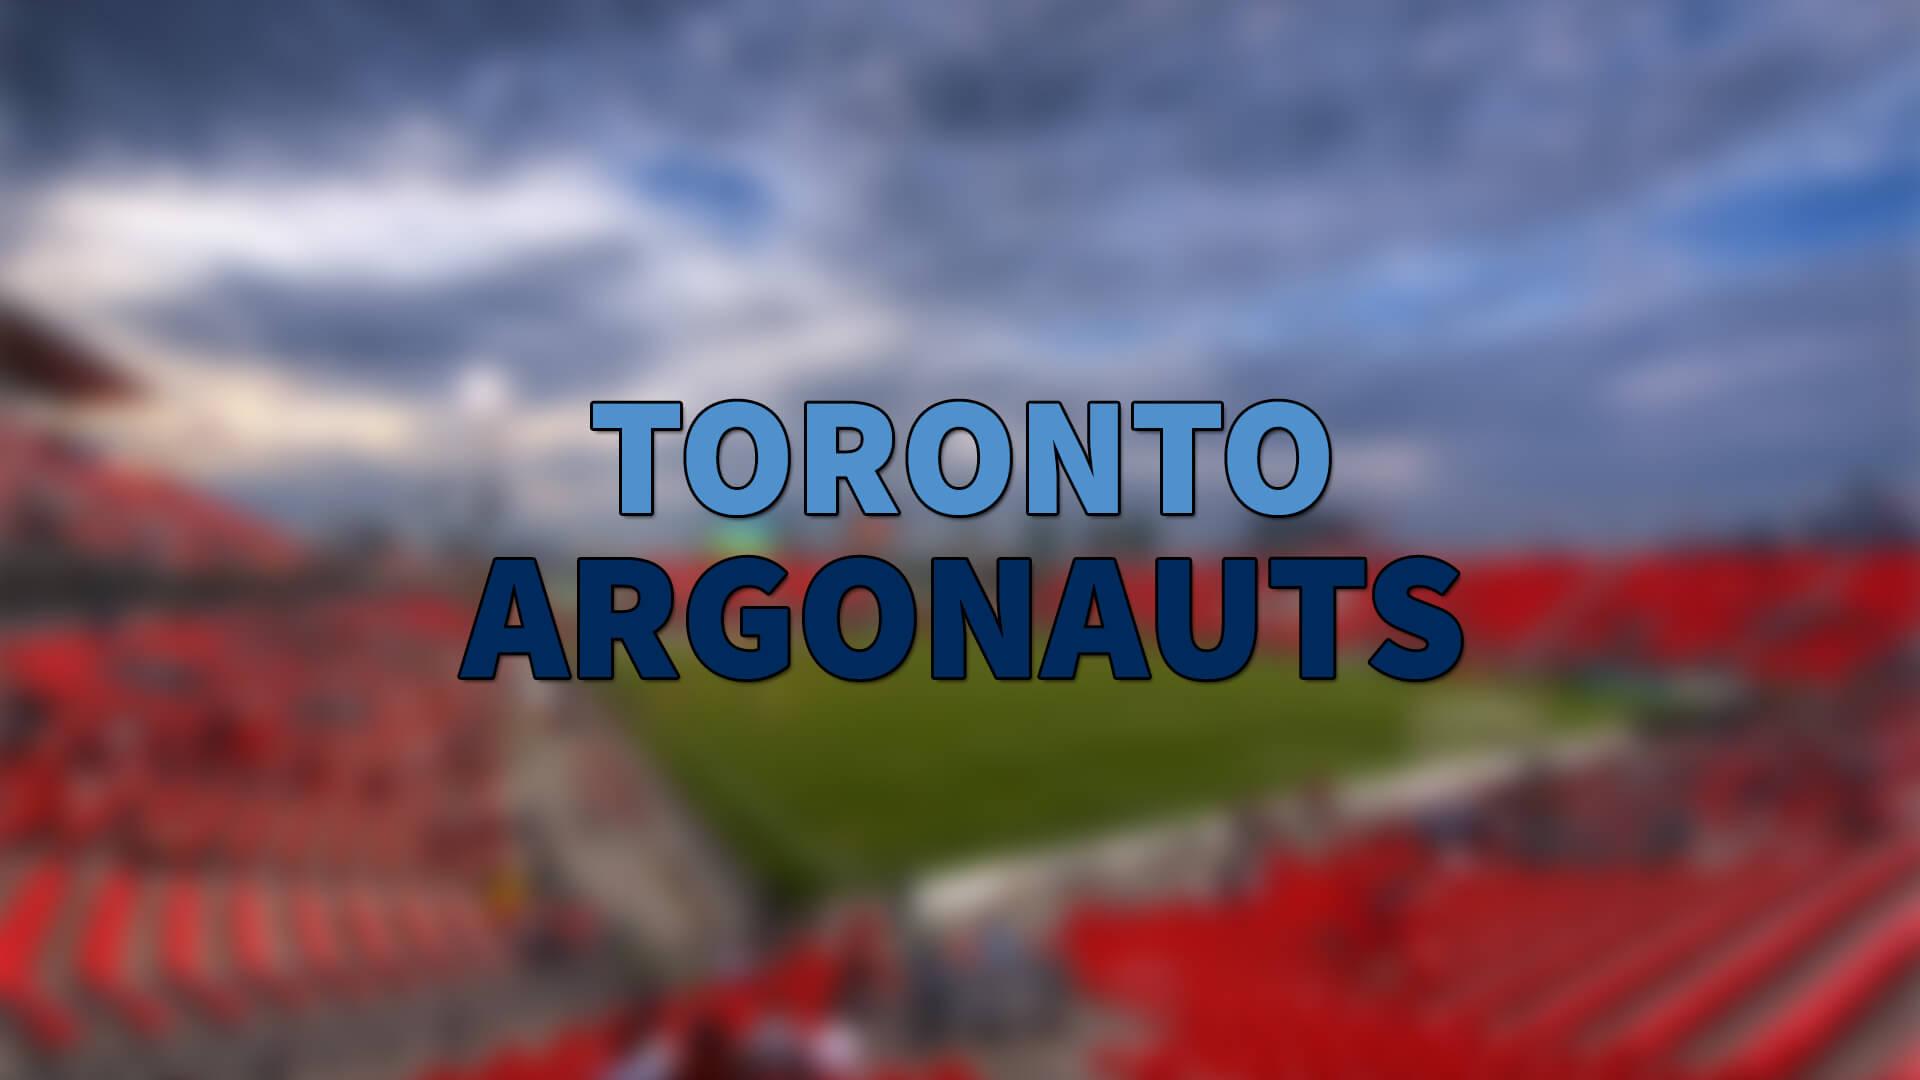 Cordarro Law Argonauts'la Anlaşma İmzaladı | Korumalı Futbol Türkiye